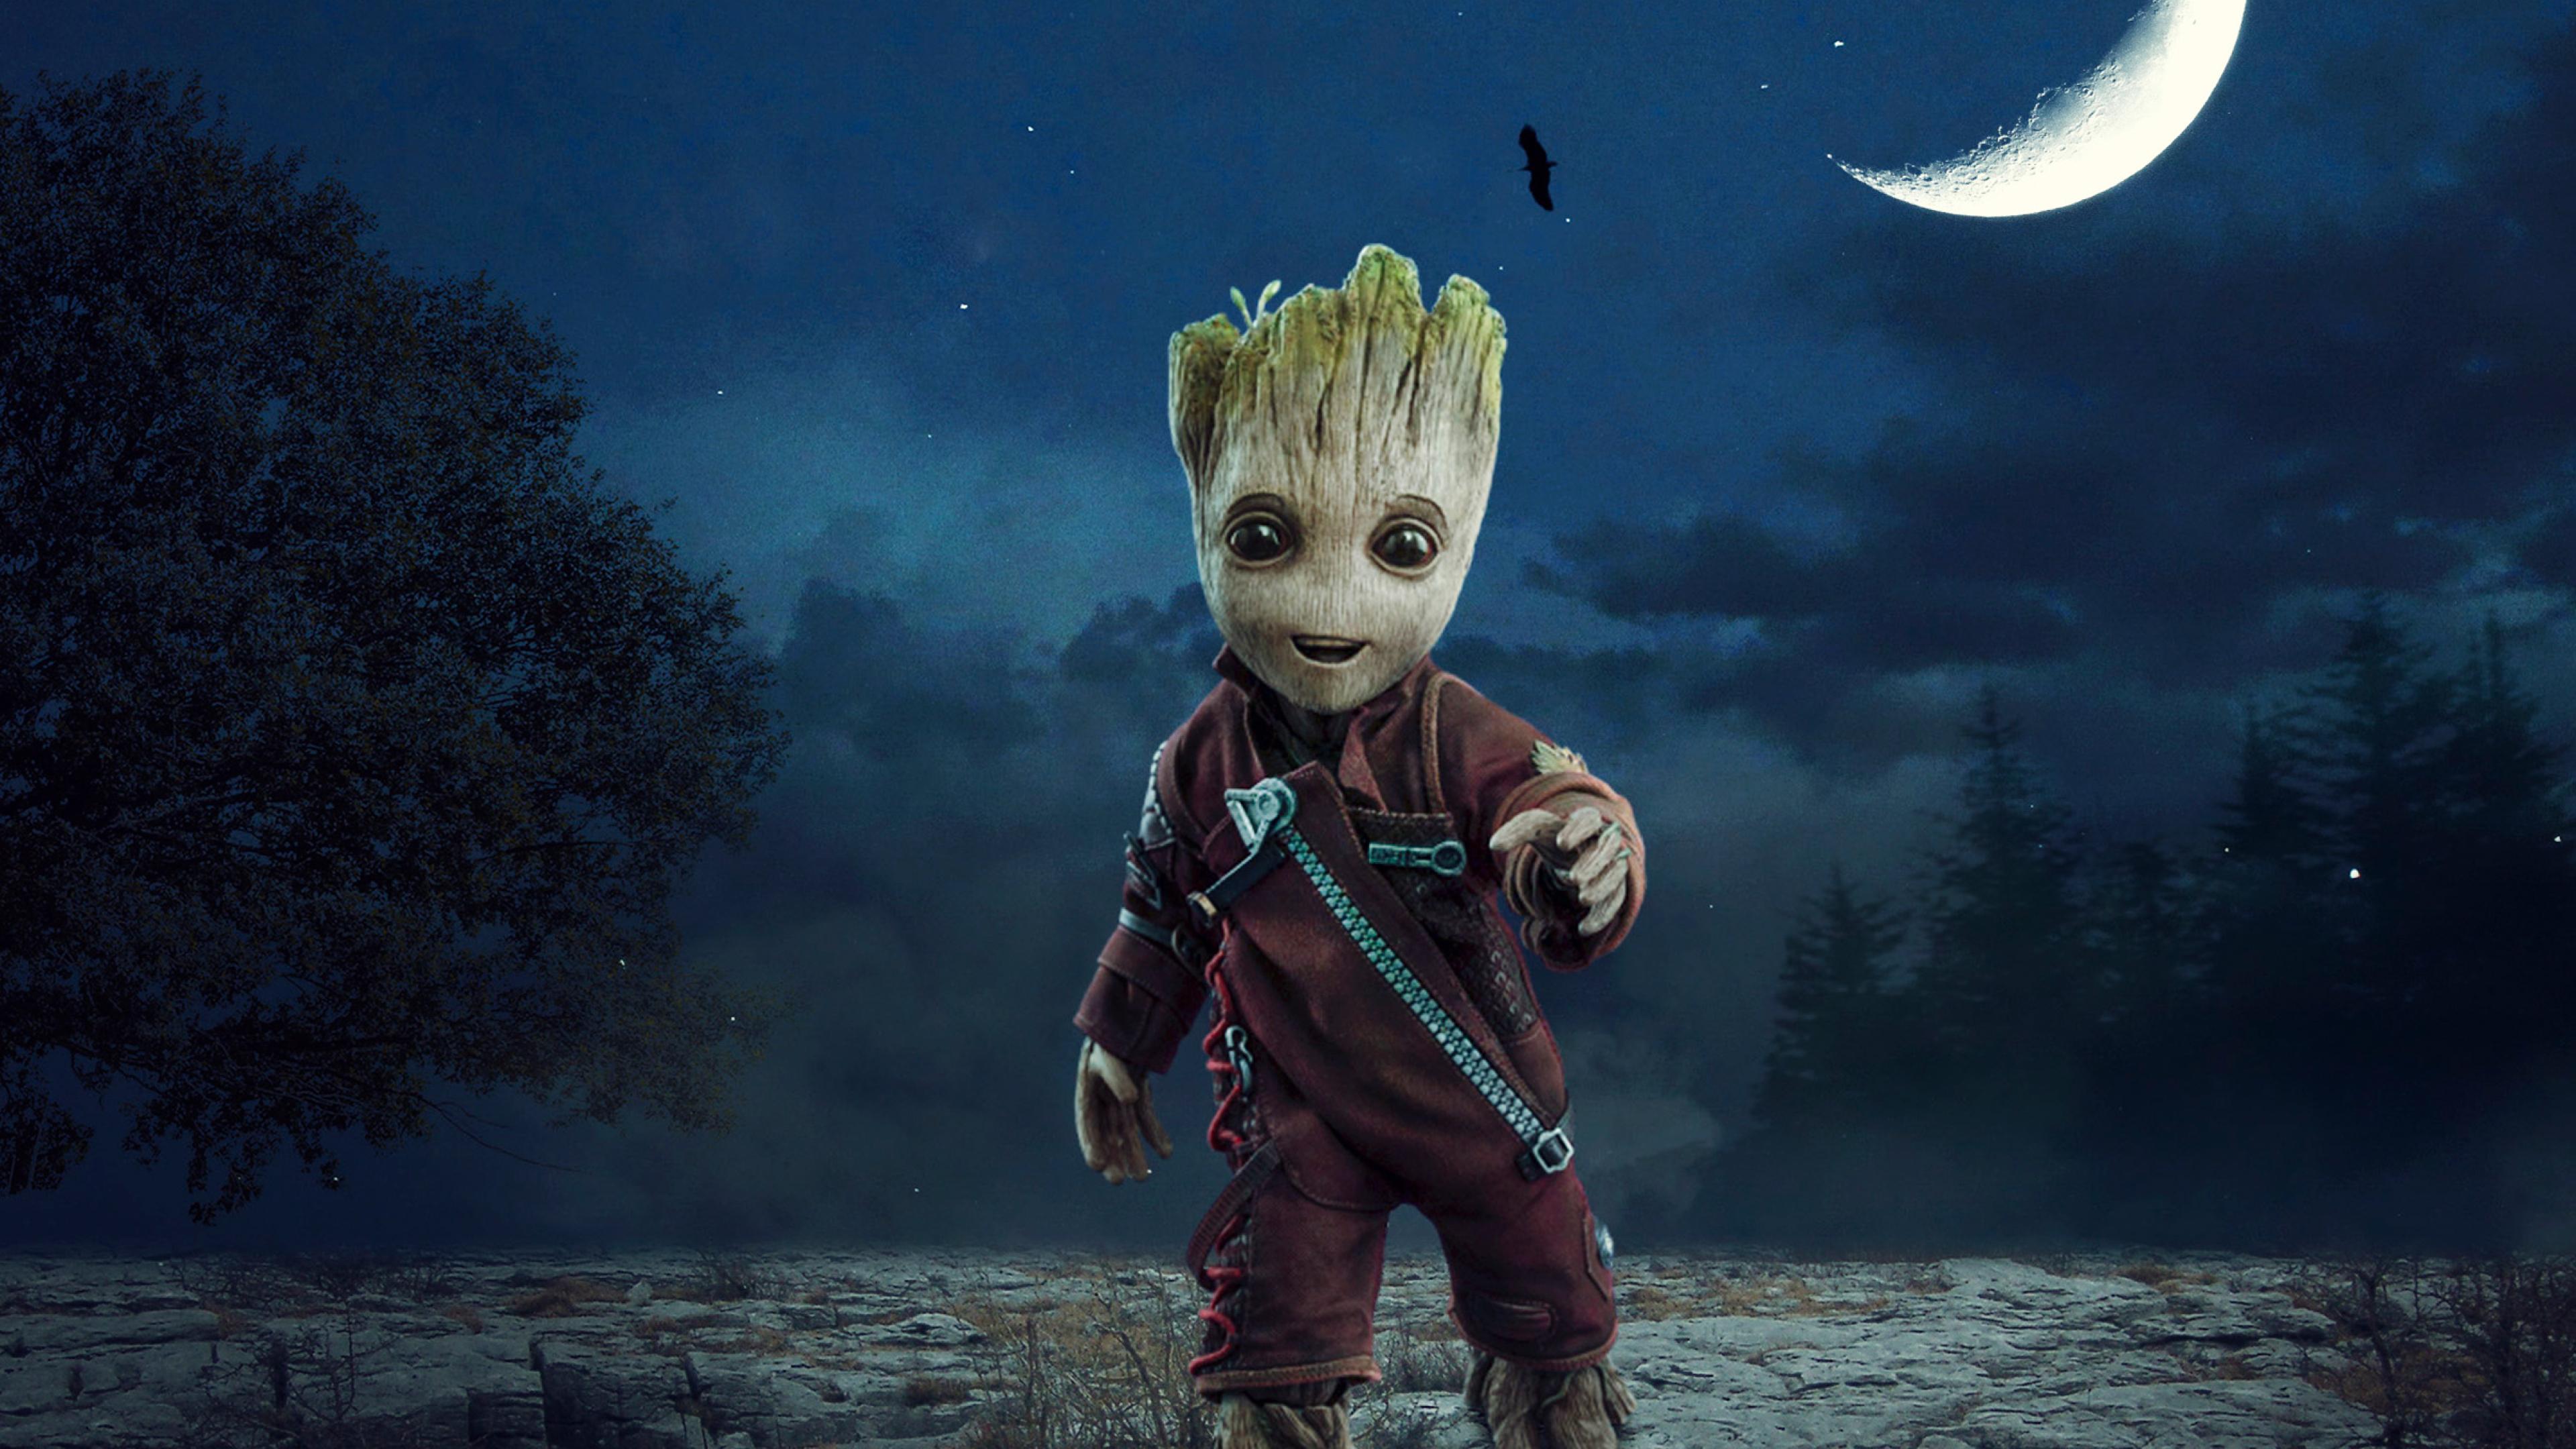 3840x2160 Baby Groot 4K Wallpaper, HD Artist 4K Wallpapers ...